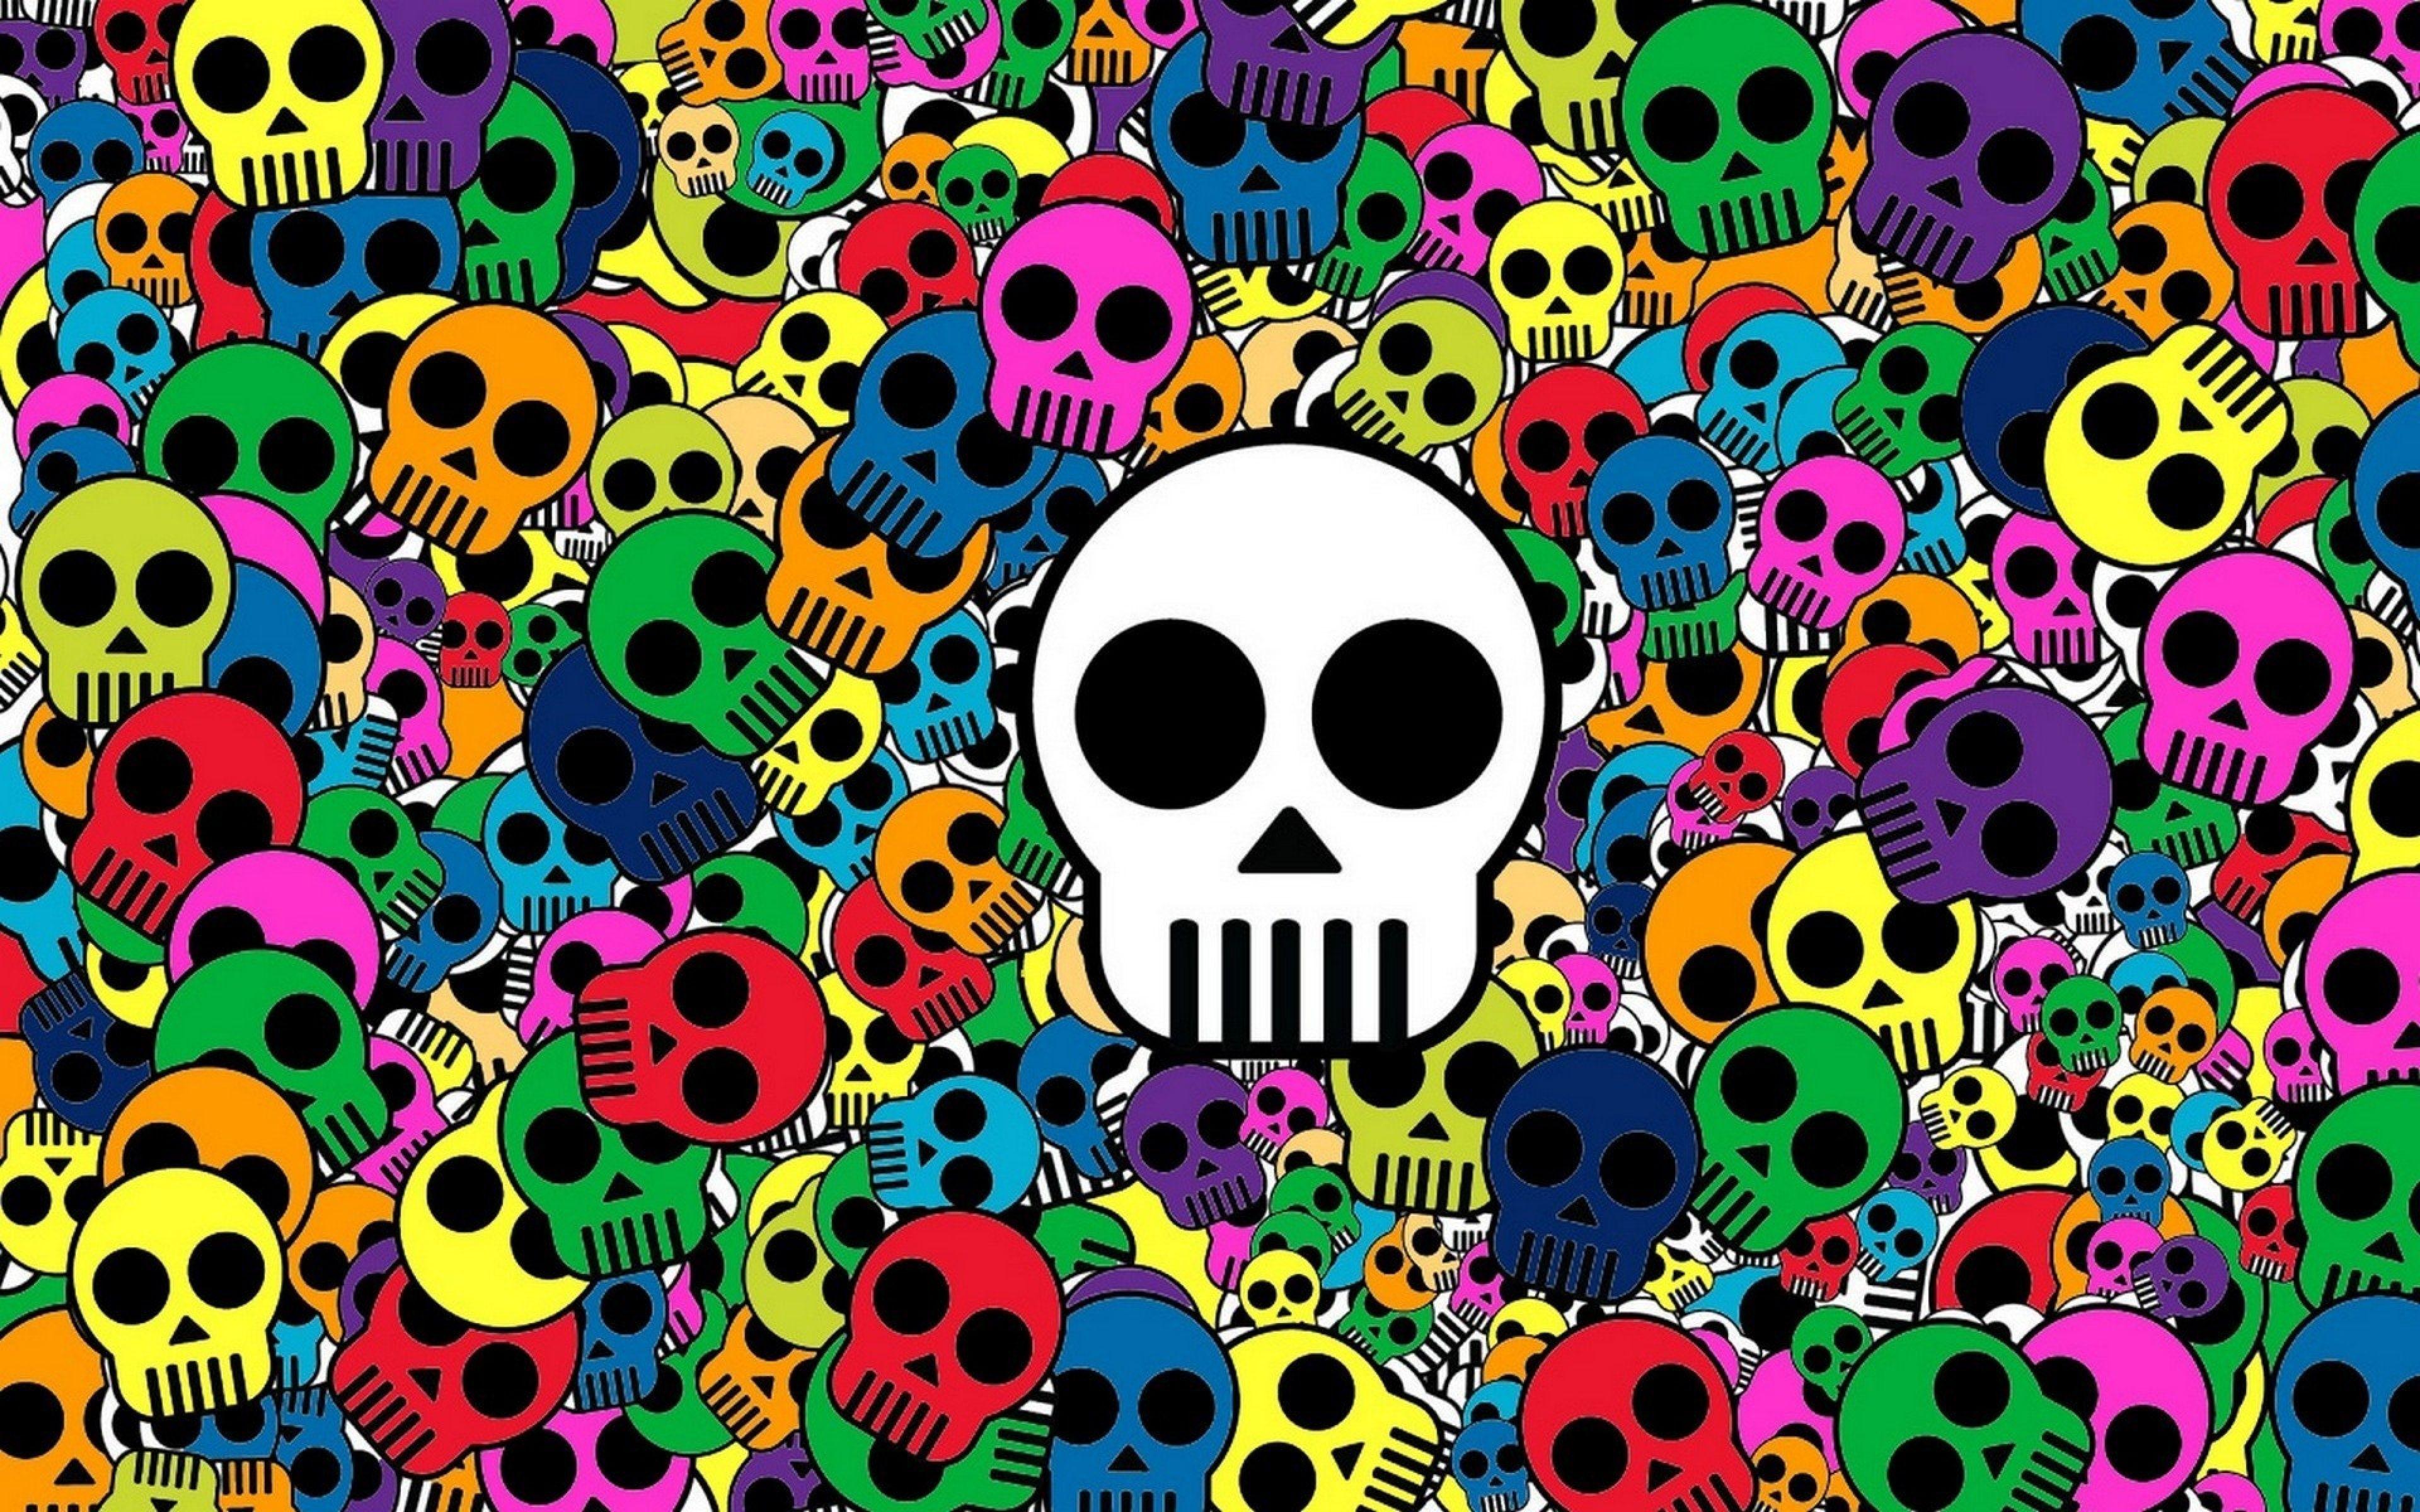 3840x2400 Wallpaper Skull Background Bright Multi Colored Skull Wallpaper Abstract Wallpaper Skull Art